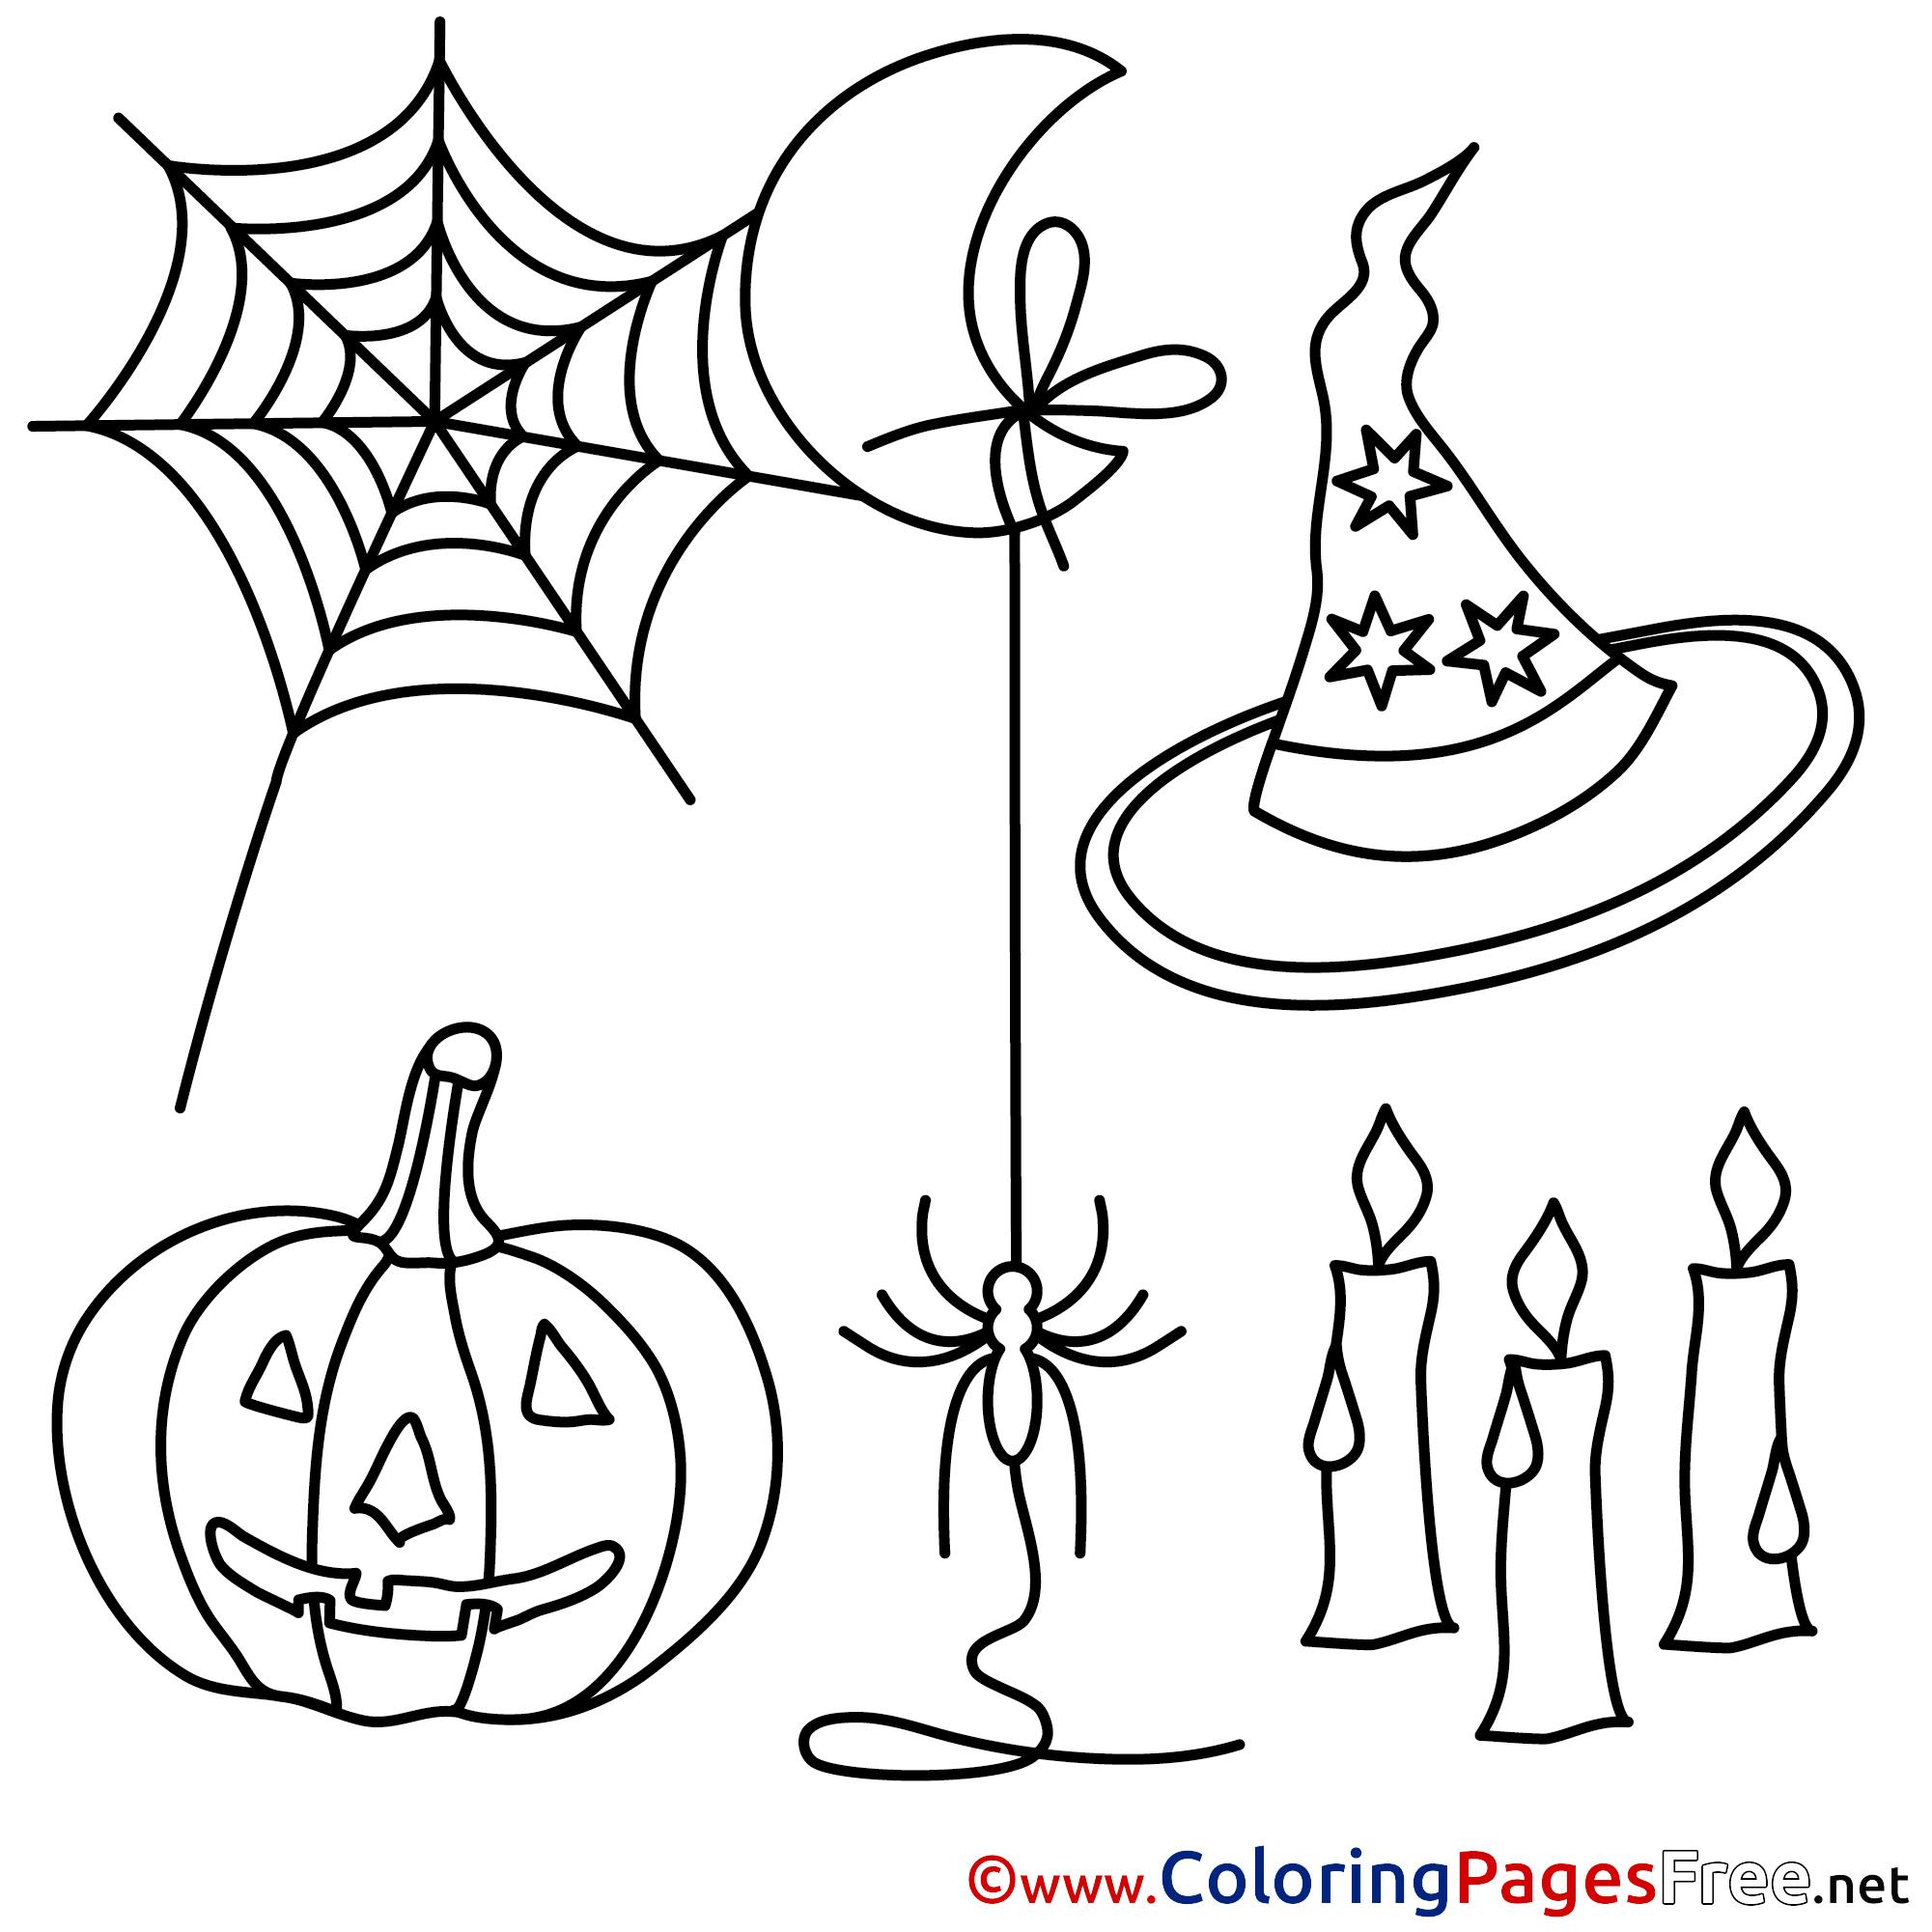 web spiders printable halloween coloring sheets web spiders printable halloween